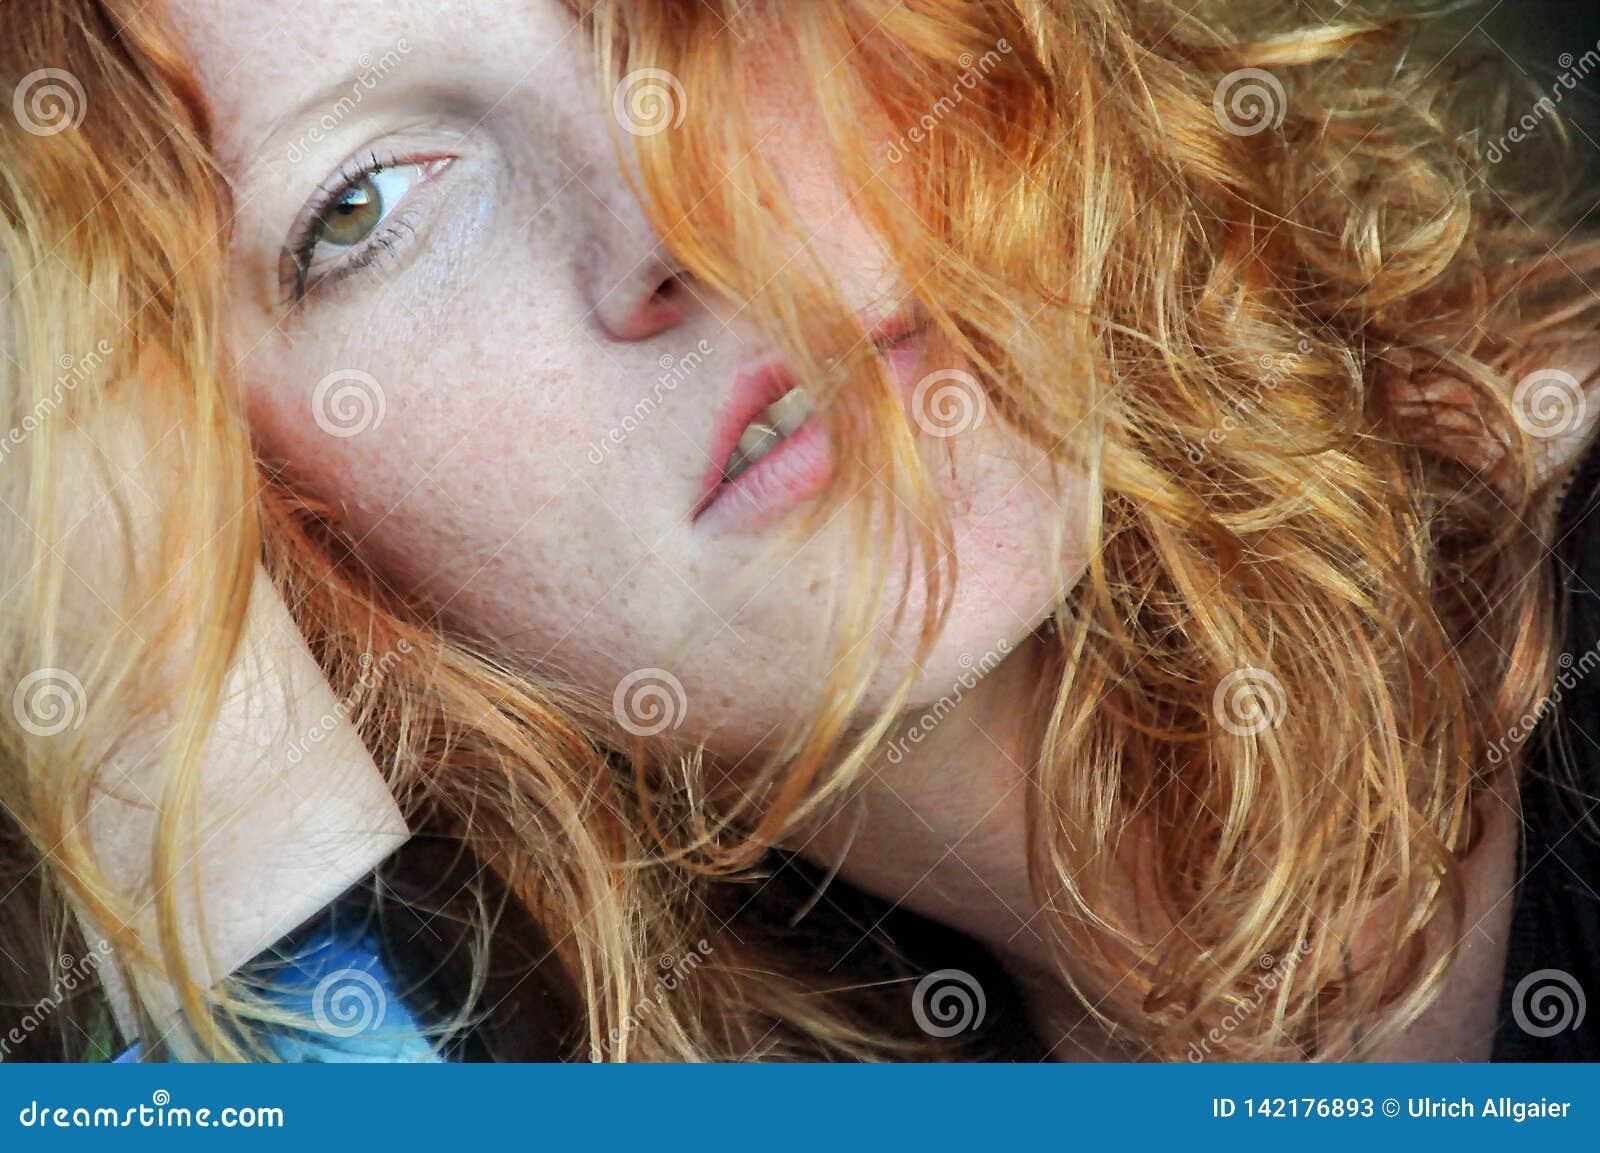 Beautiful sensual portrait in closeup of a thoughtful young redhead wistful